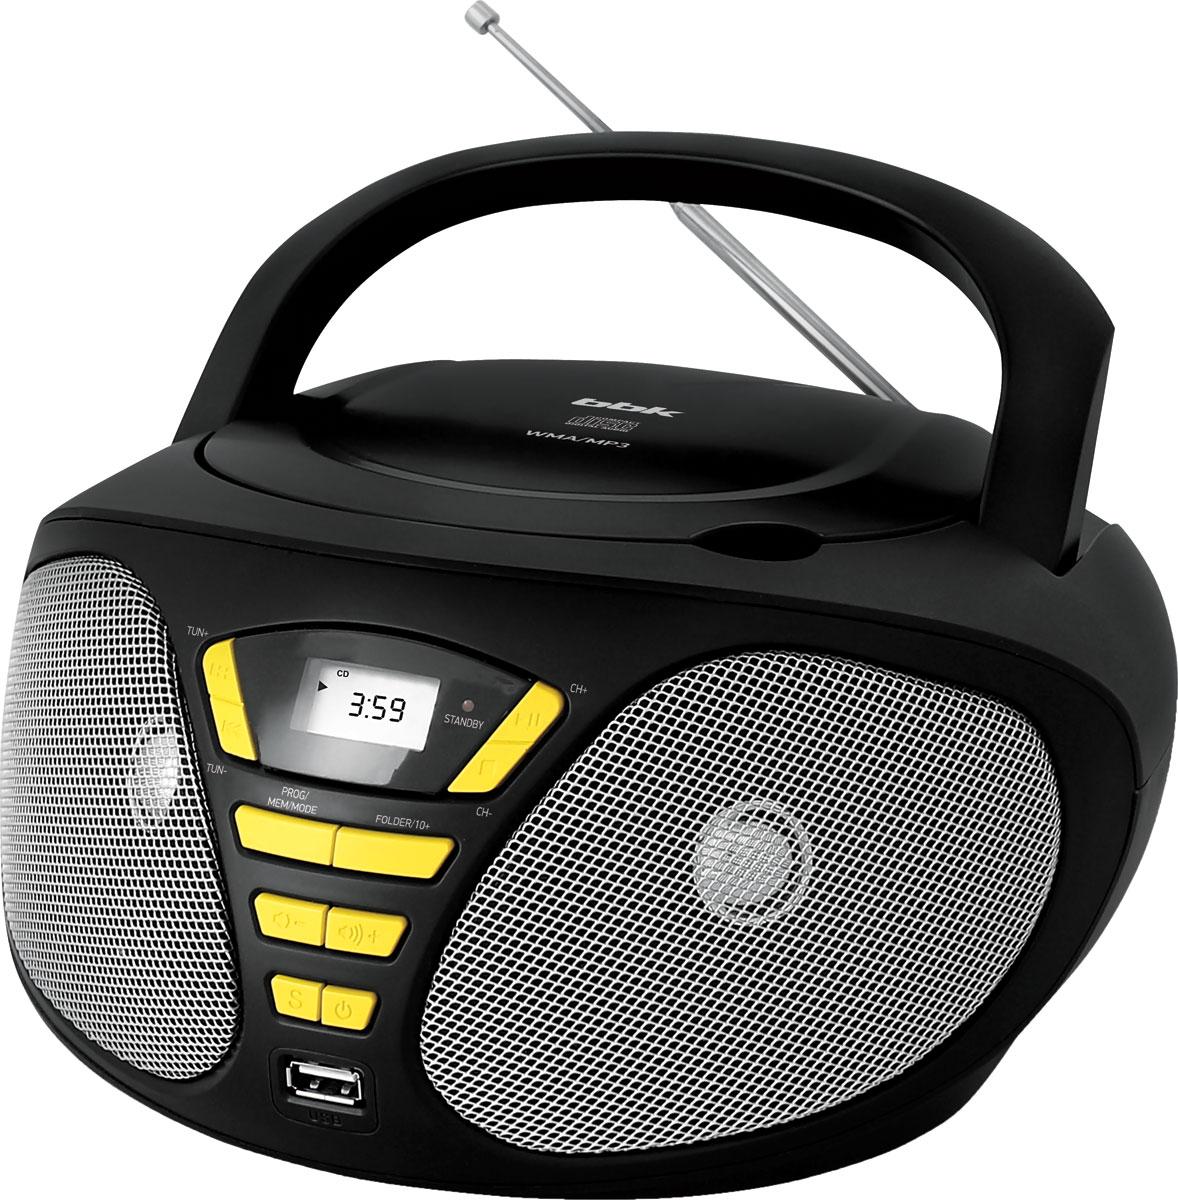 Фото - BBK BX180U, Black Yellow CD/MP3 магнитола sunbenbo multifunction 5 in 1 fm wireless headset earphone for mp4 pc tv cd mp3 black with raido headphone headphones